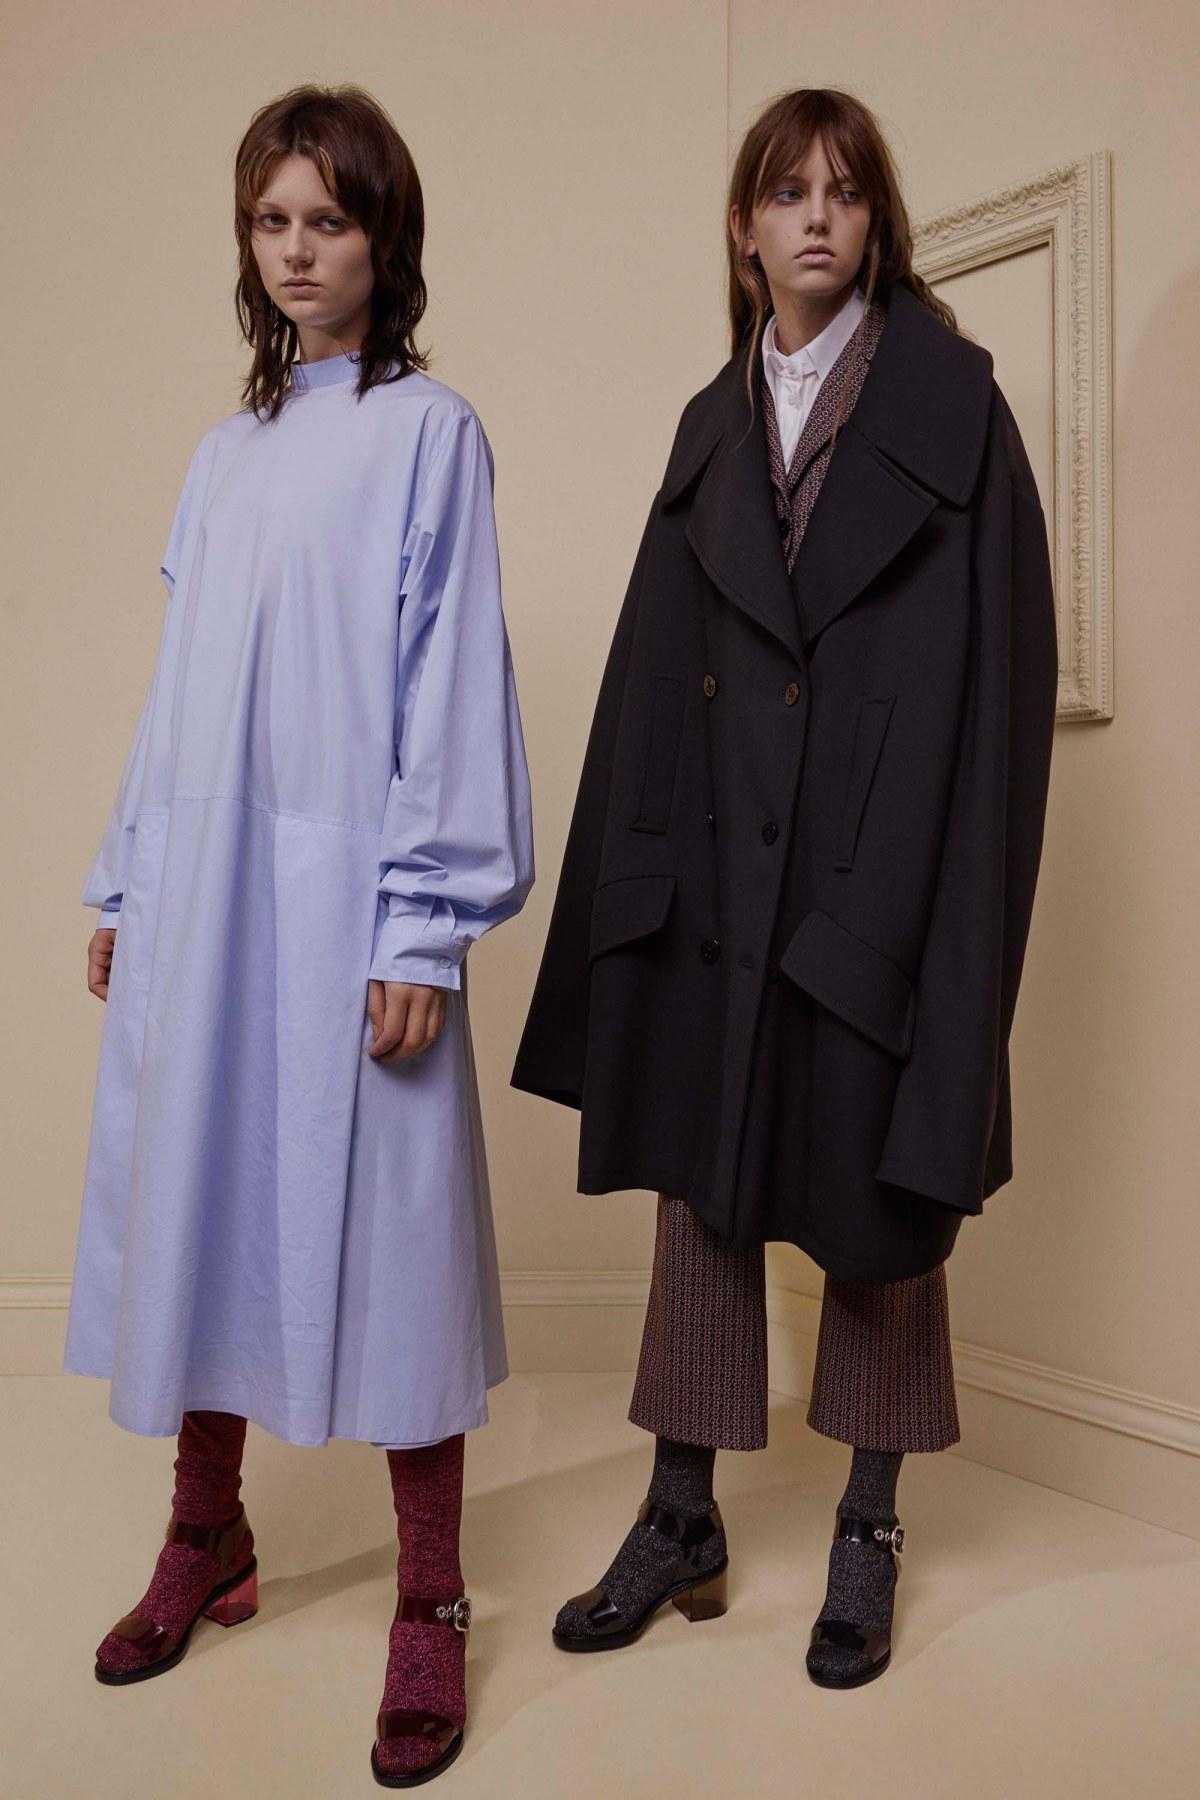 mm6-maison-margiela-pre-fall-2017-fashion-show-the-impression-08